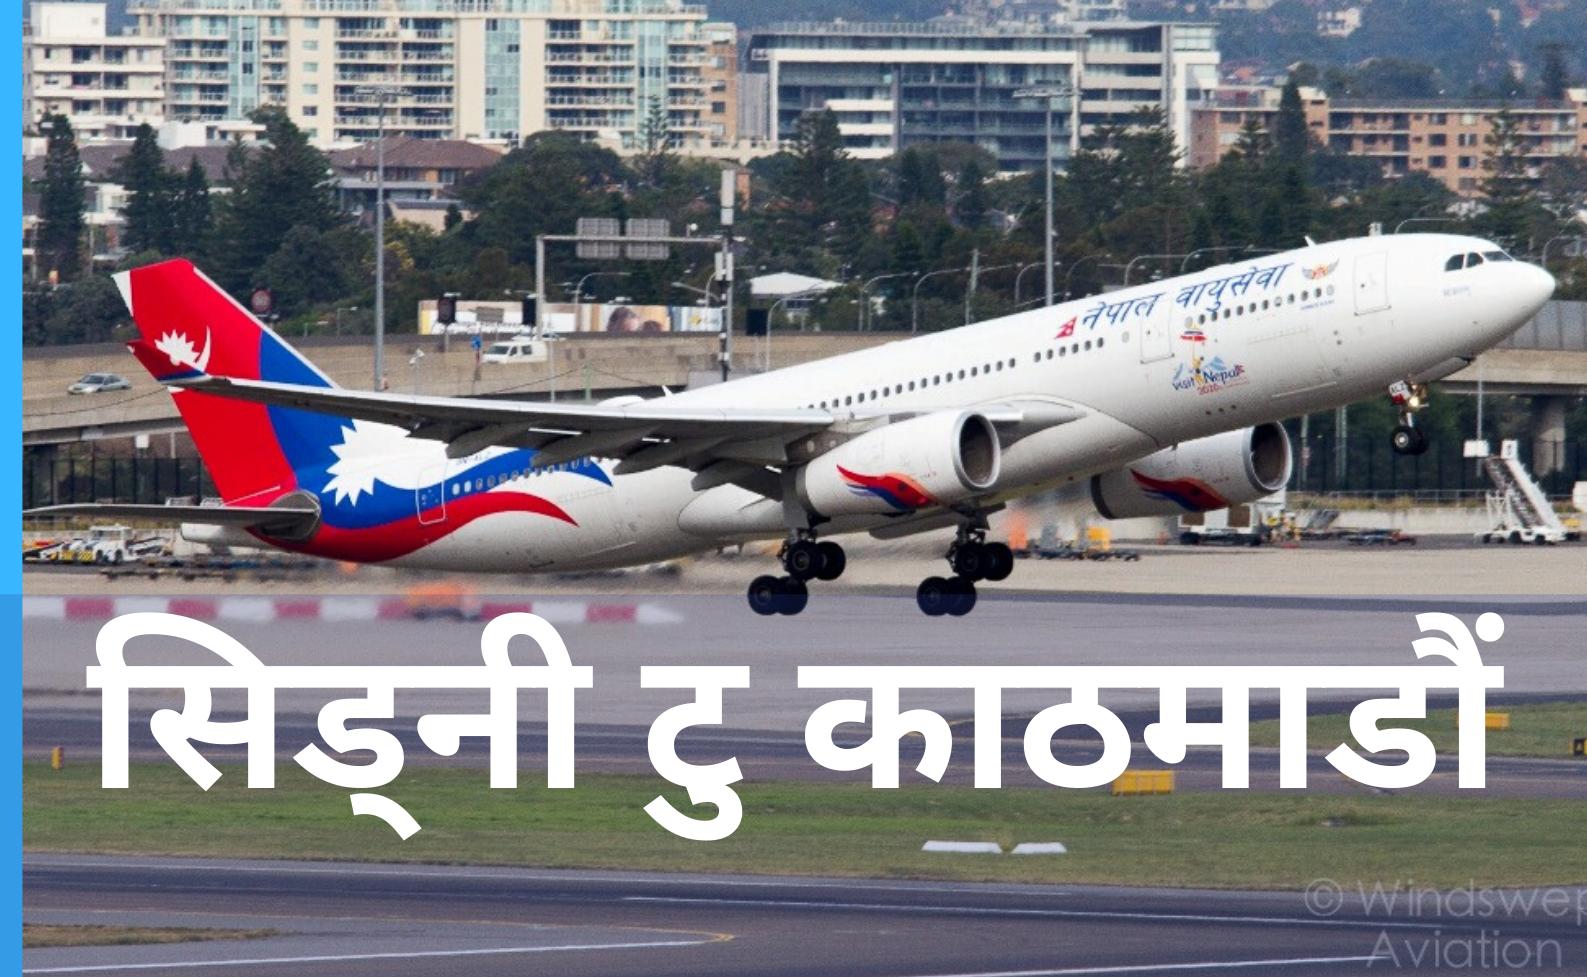 The Nepal Airlines repatriation flight from Sydney to Kathmandu, Nepal